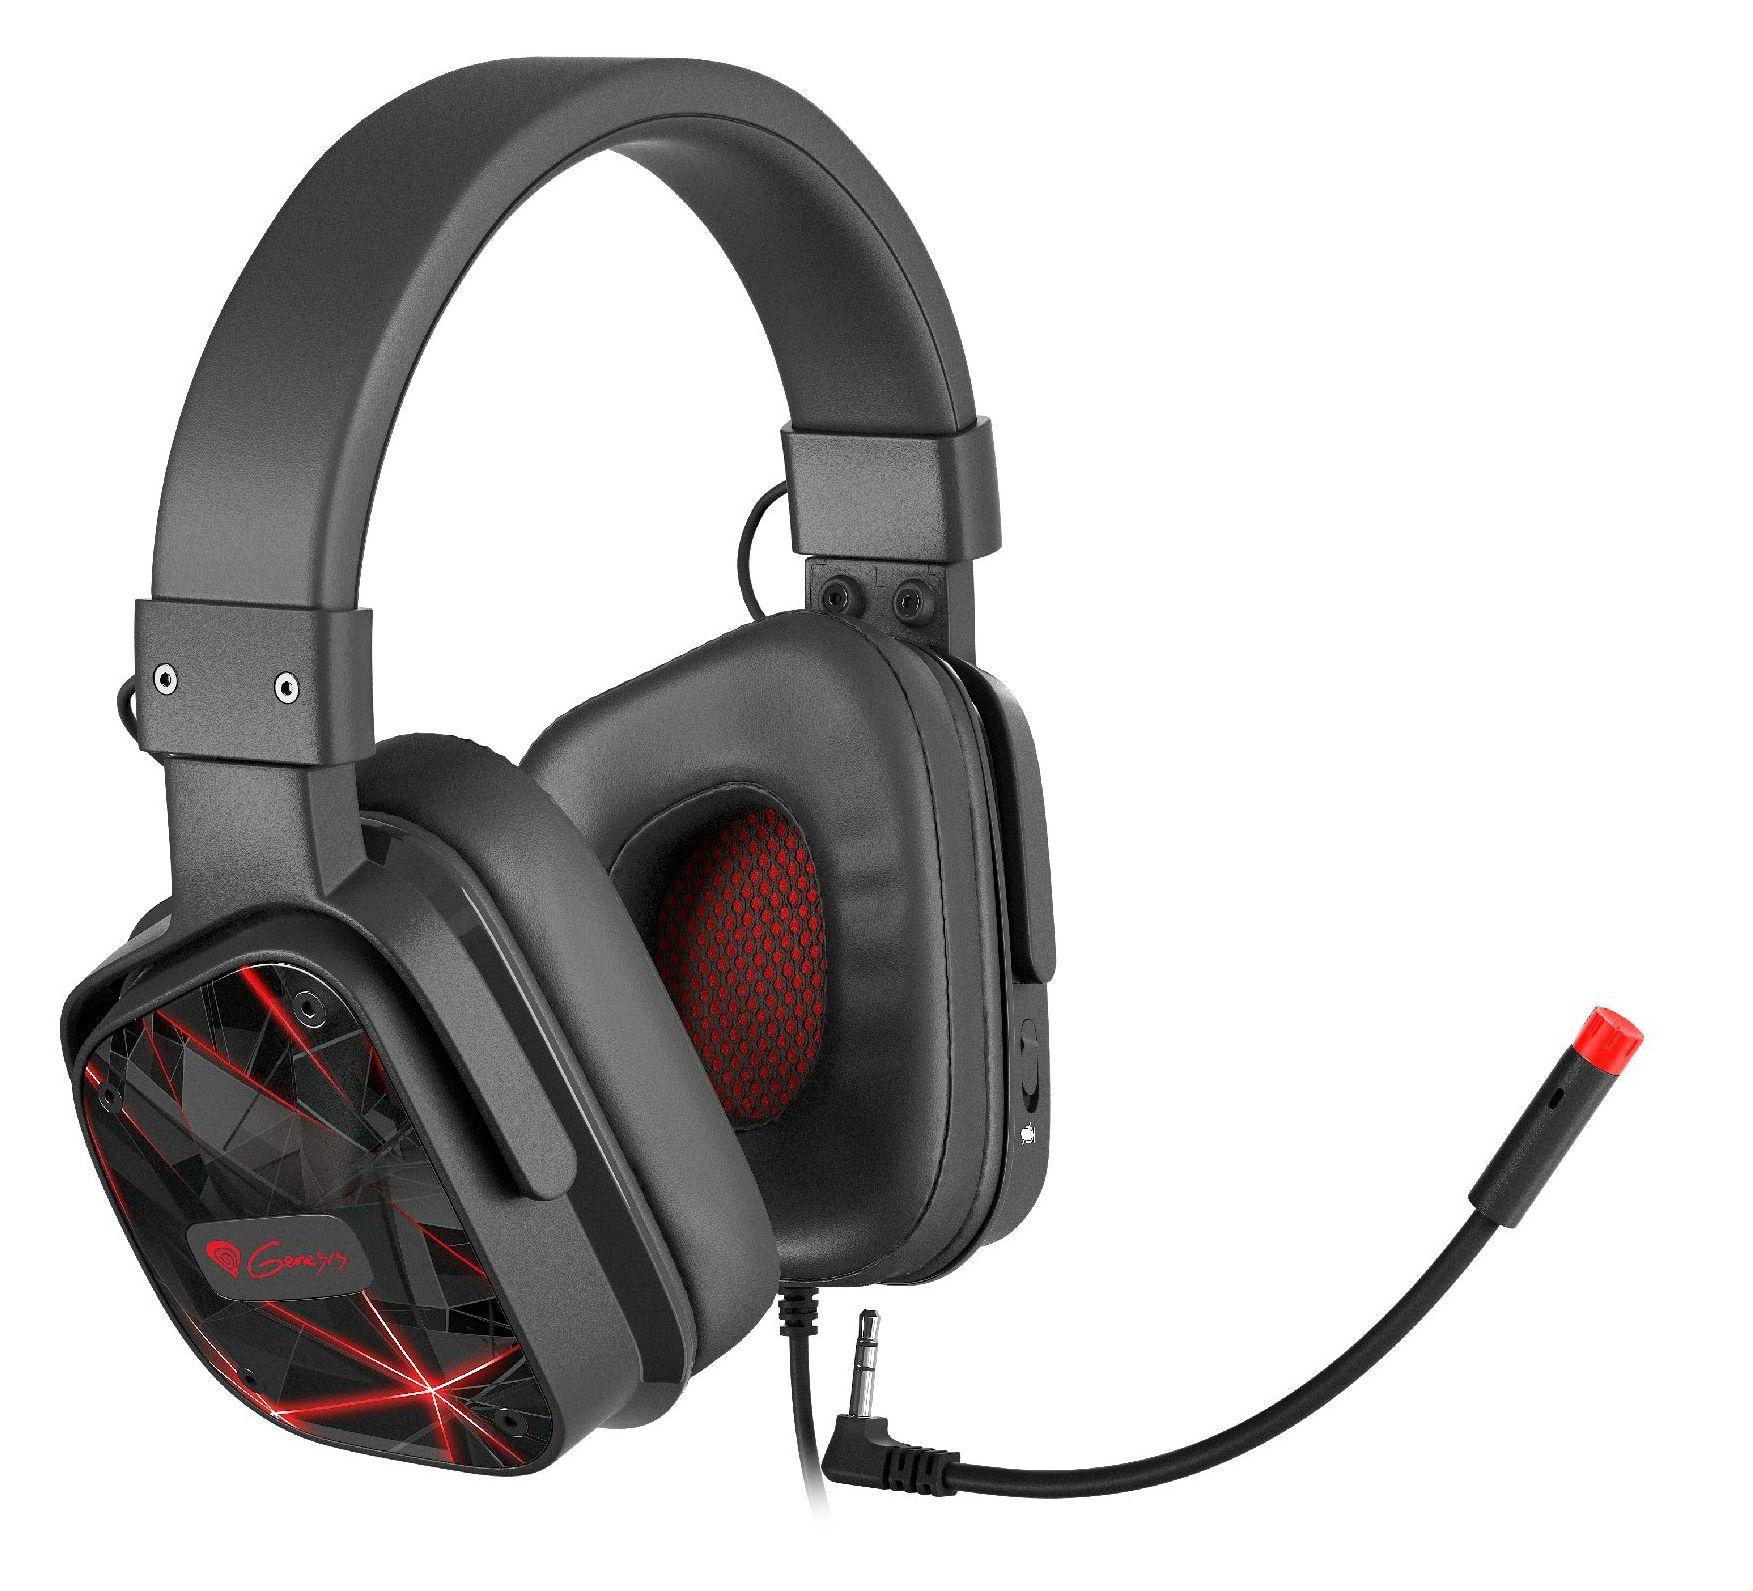 Гейминг слушалки с микрофон Genesis - Argon 570, черни - 3